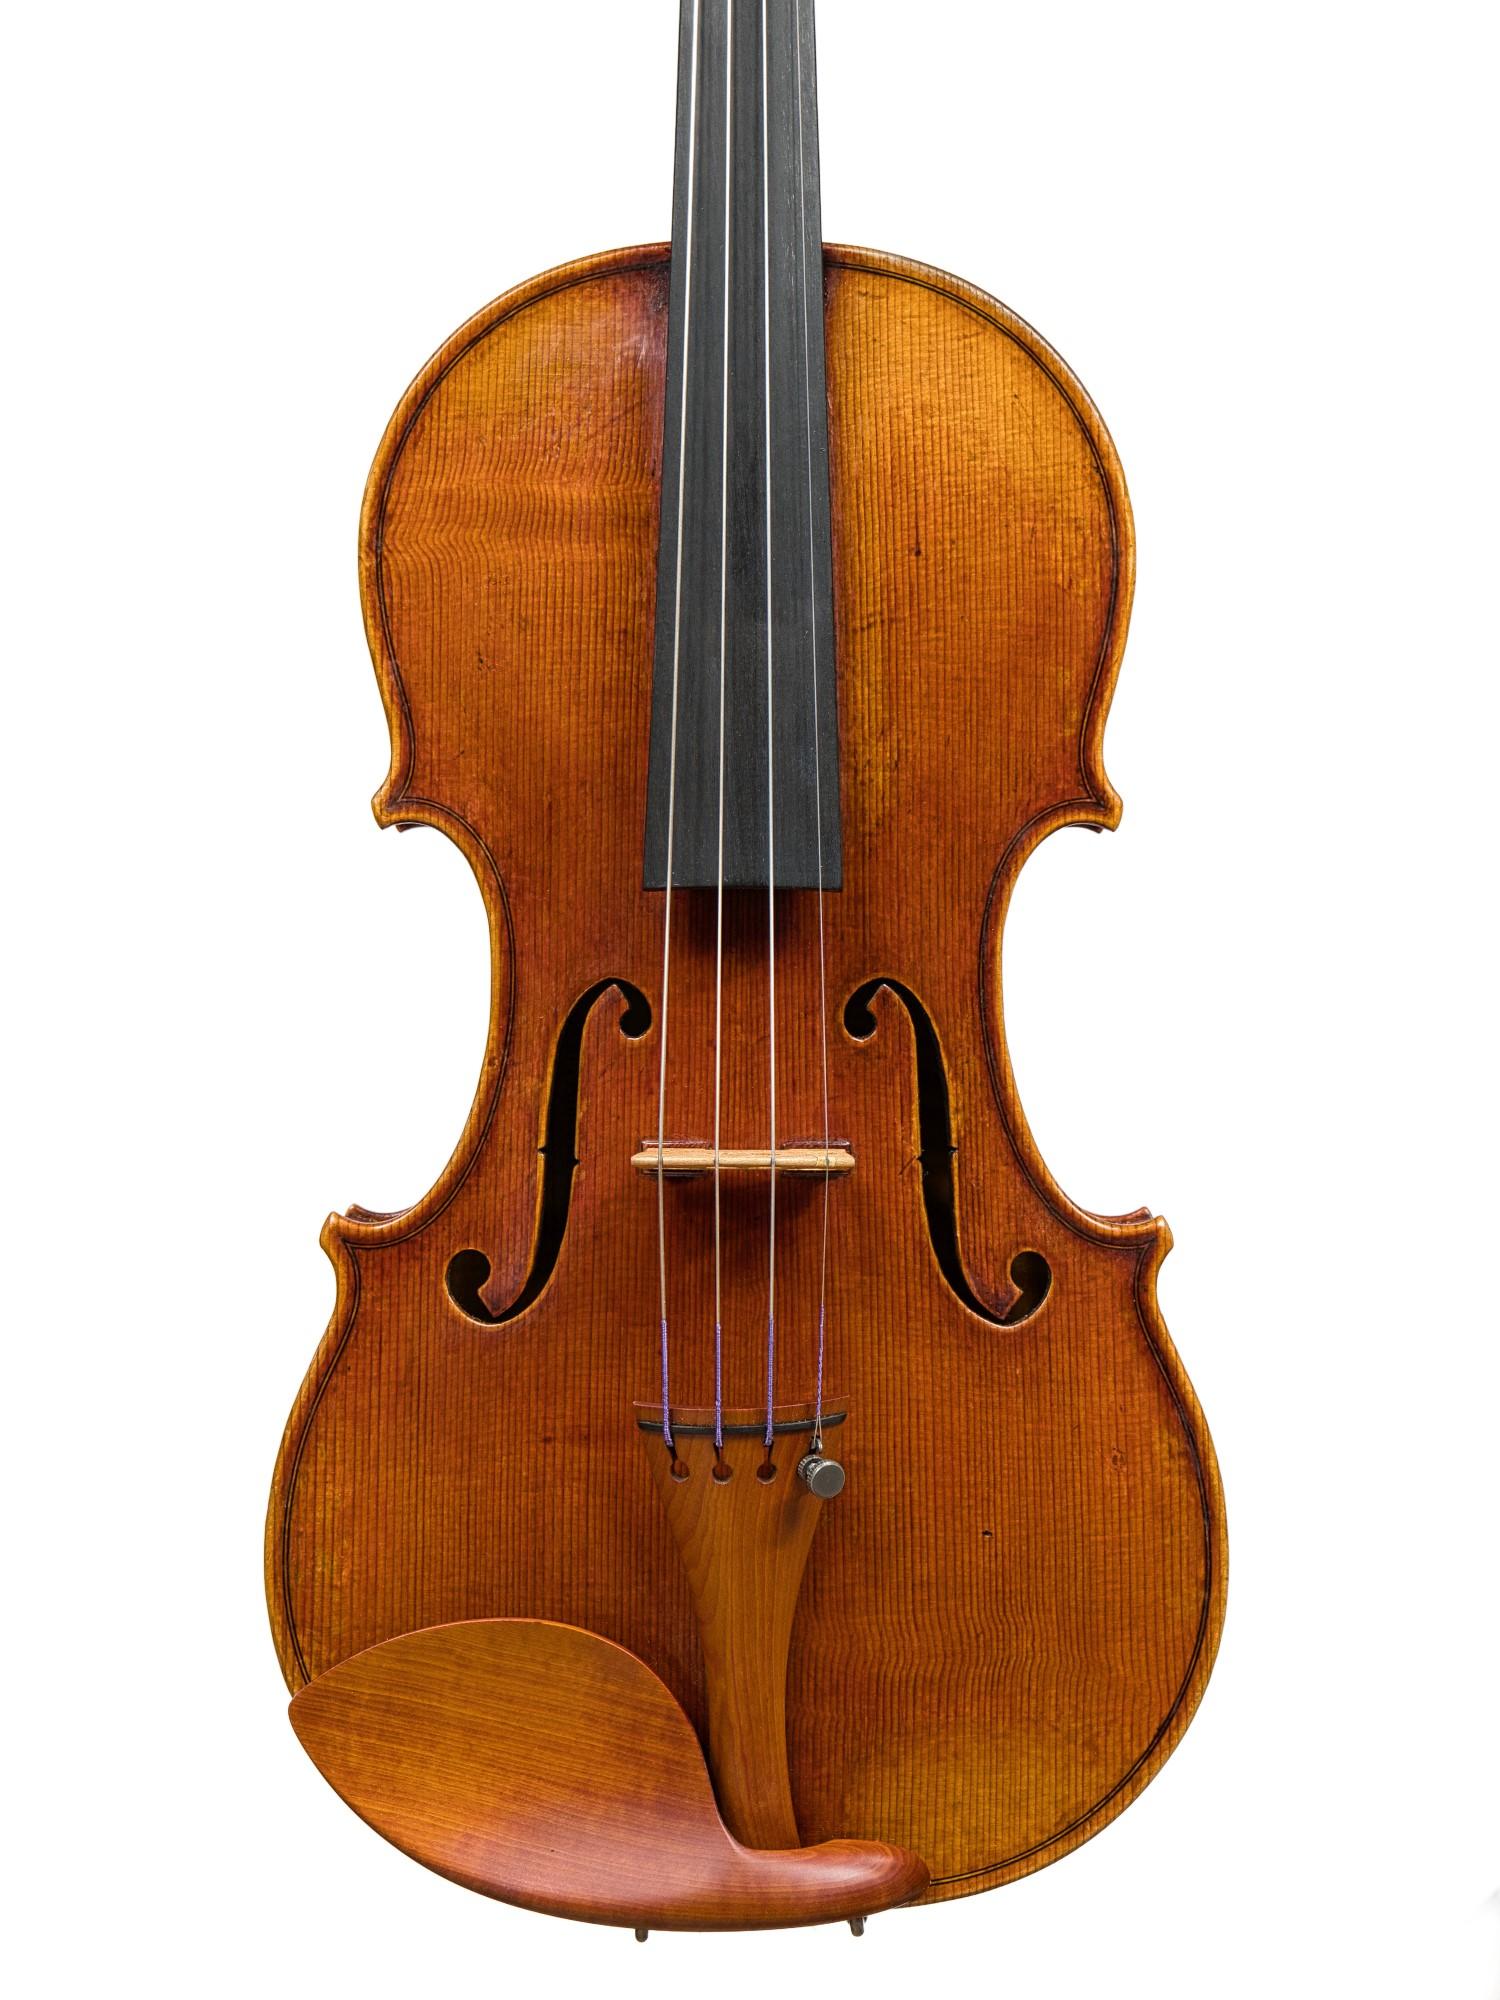 Violin by Joseph Curtin, 2021